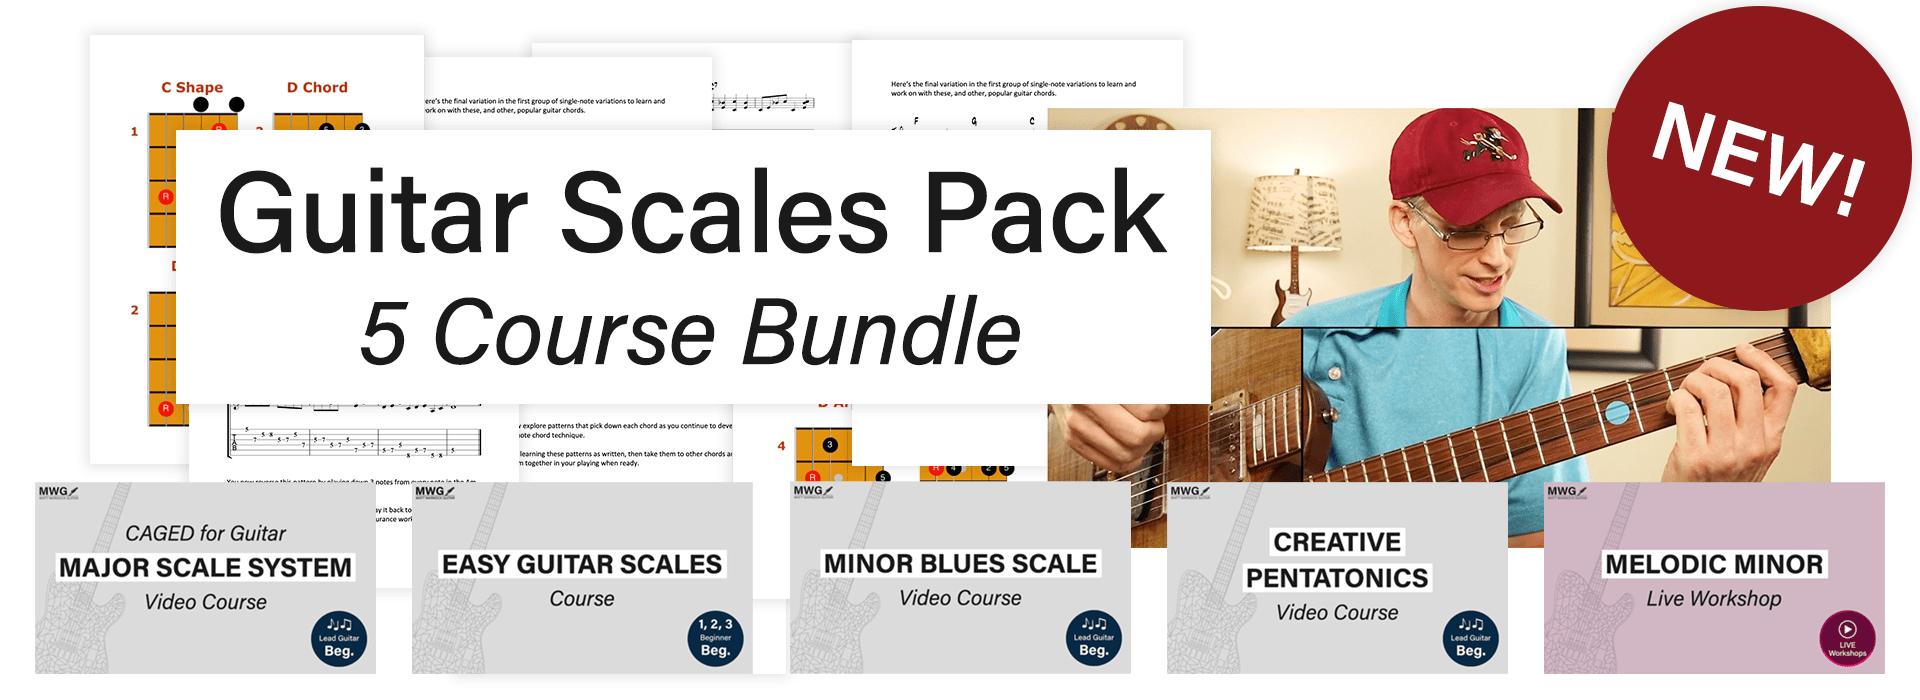 guitar scales pack